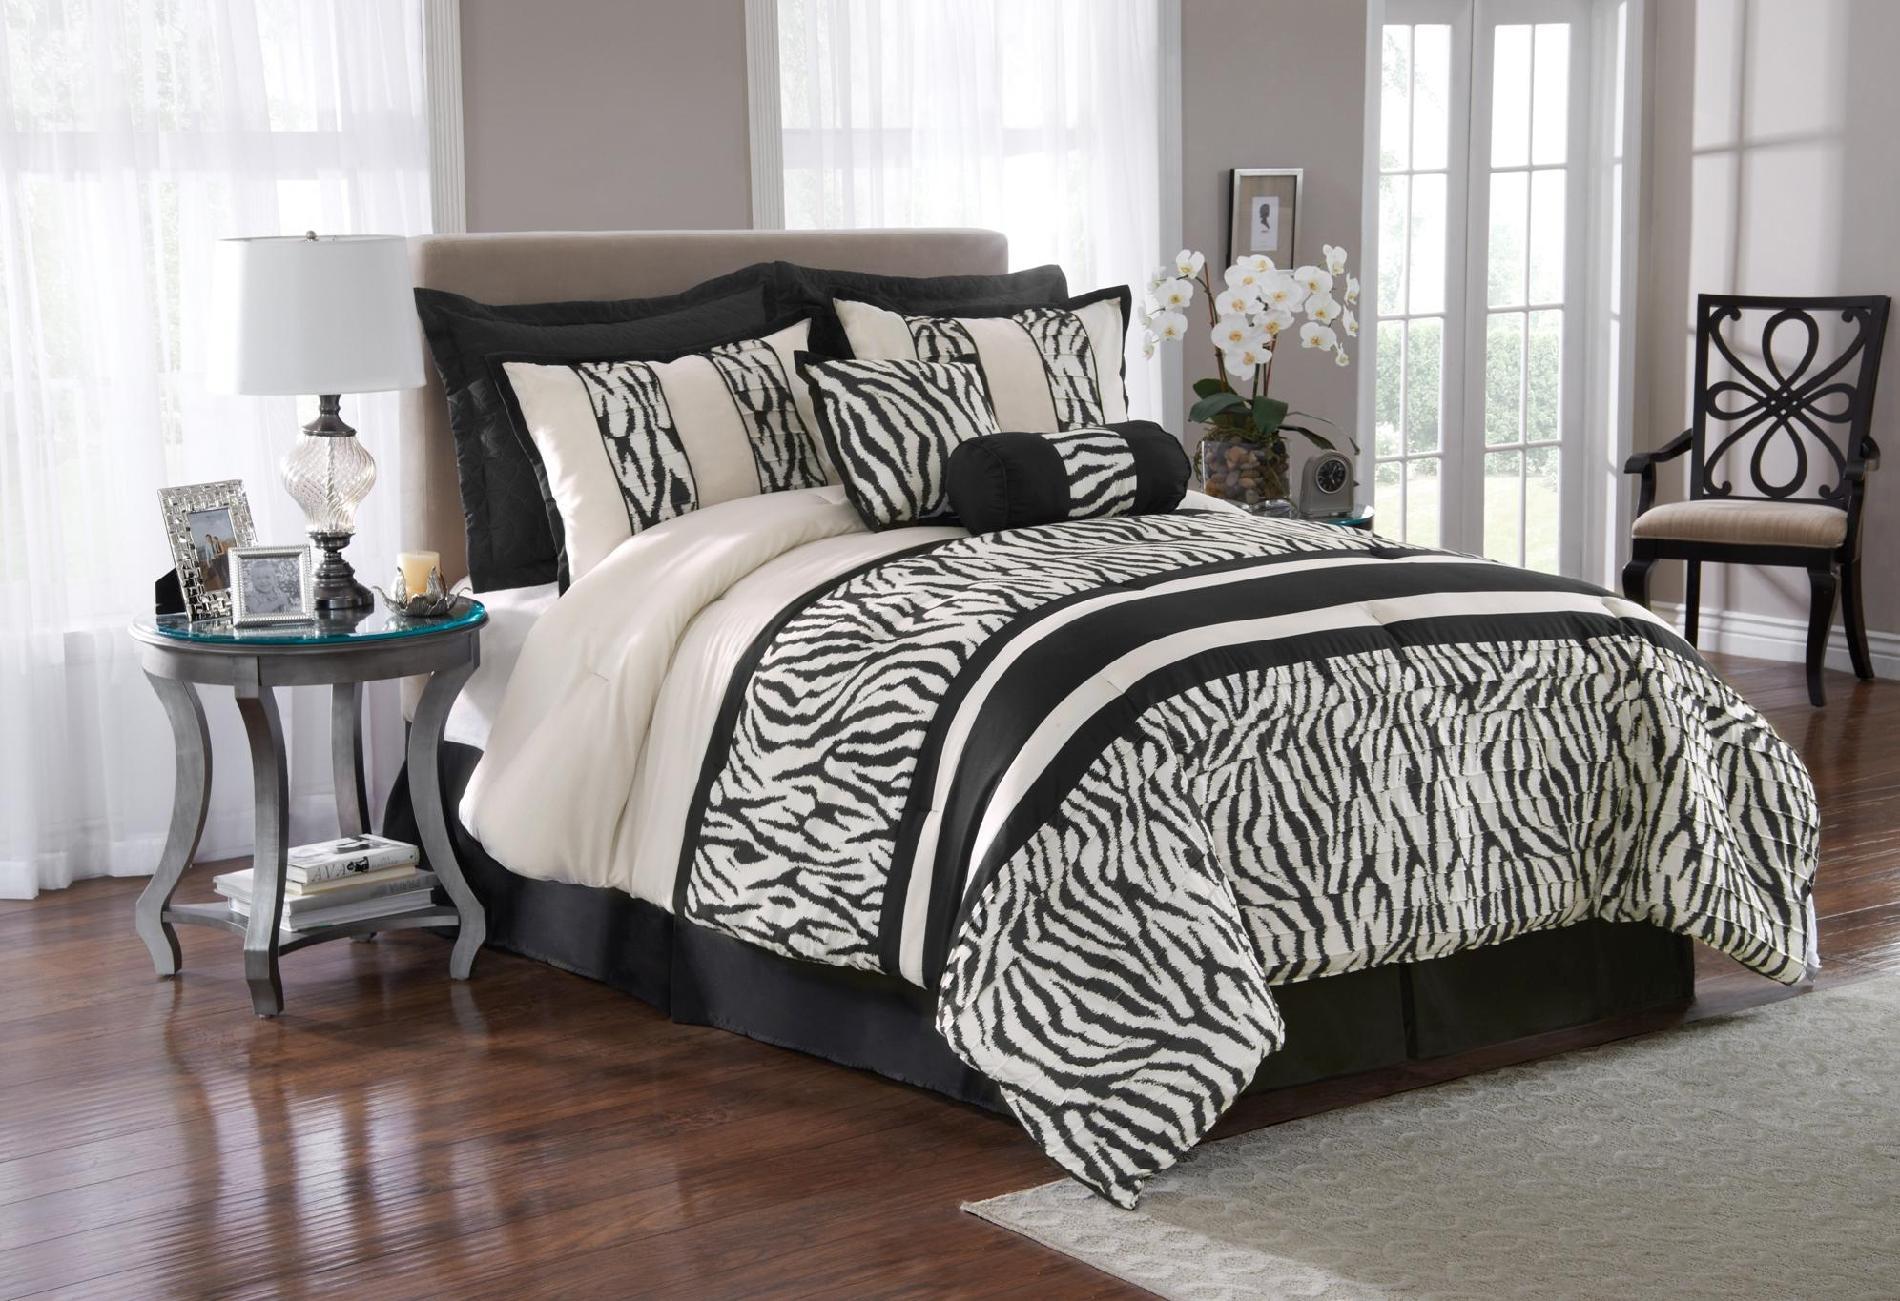 The Great Find 8 Piece Zebra Print Bedding Set Home